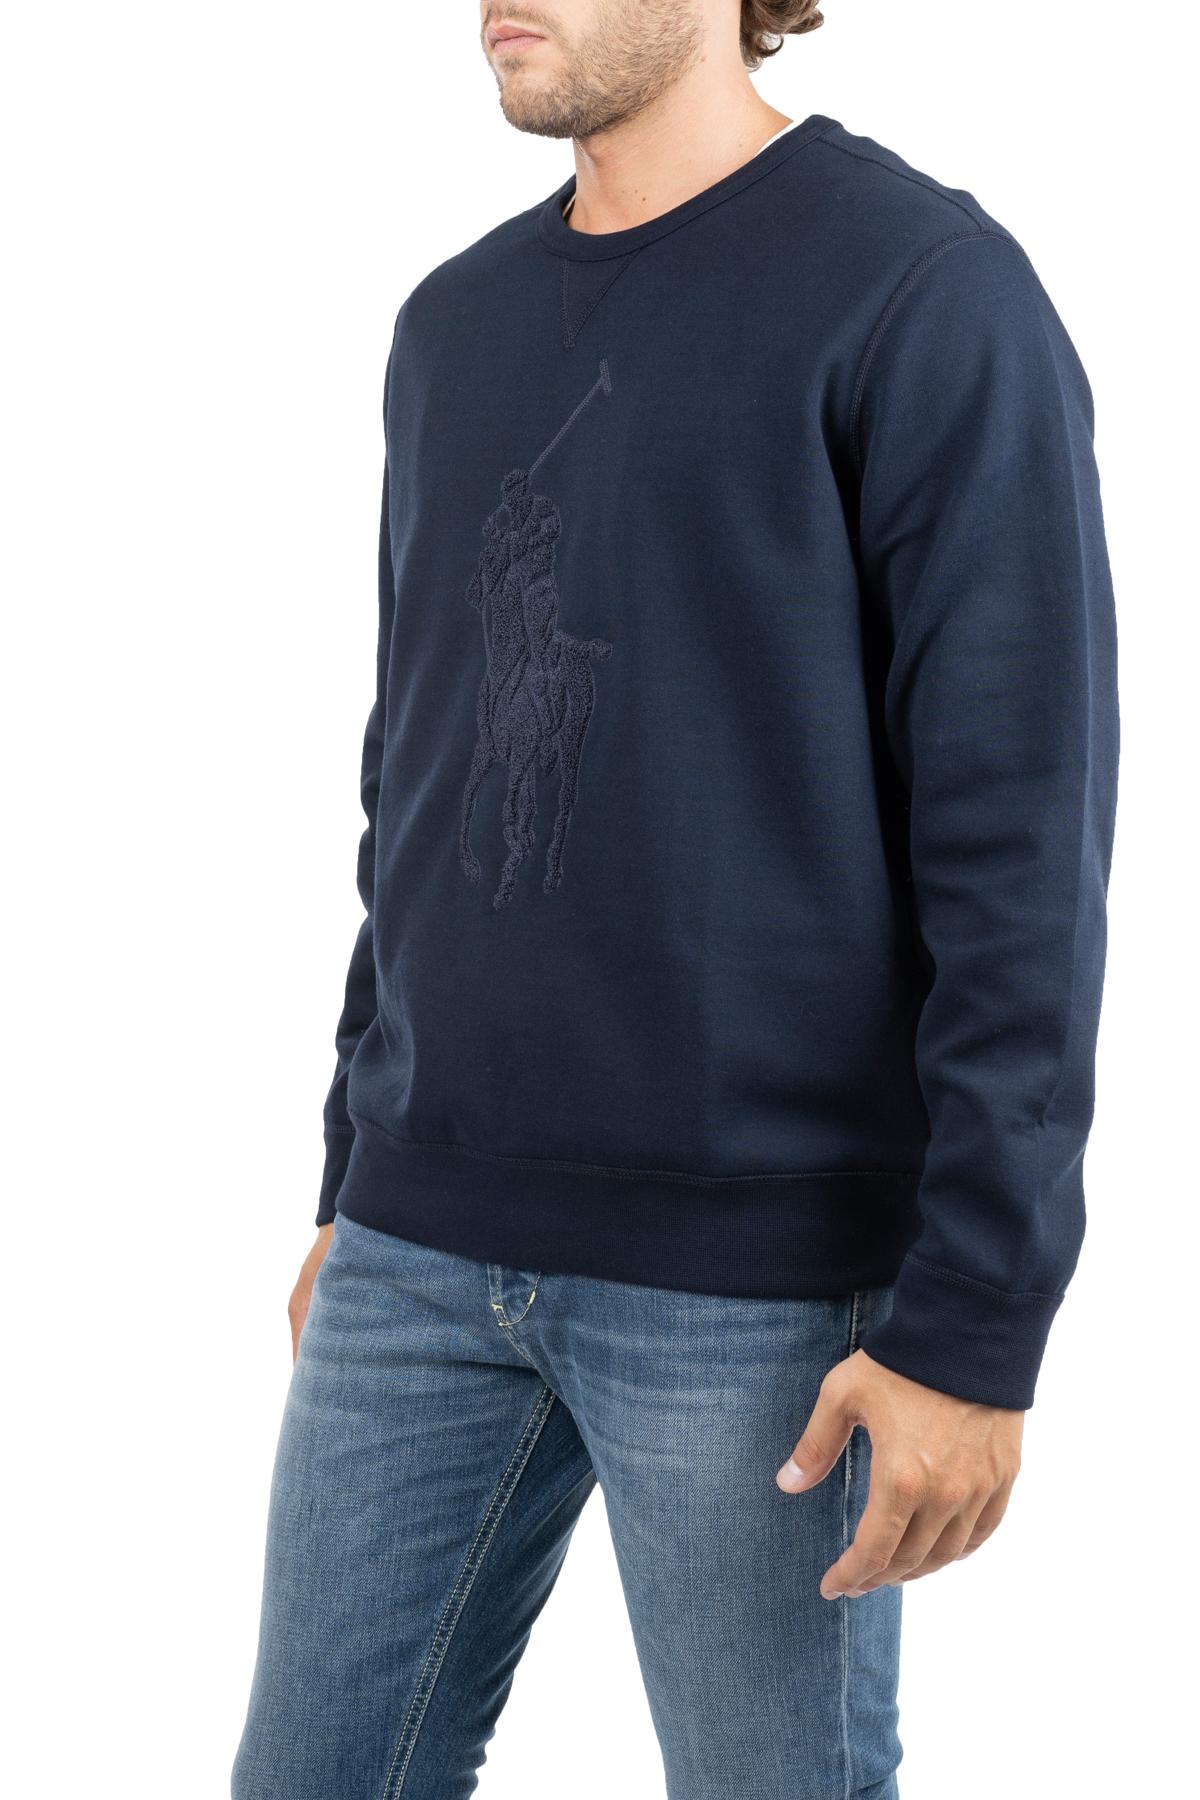 BLUE SWEATSHIRT WITH FRONT LOGO EMBROIDERY POLO RALPH LAUREN   Sweatshirts   710766862009